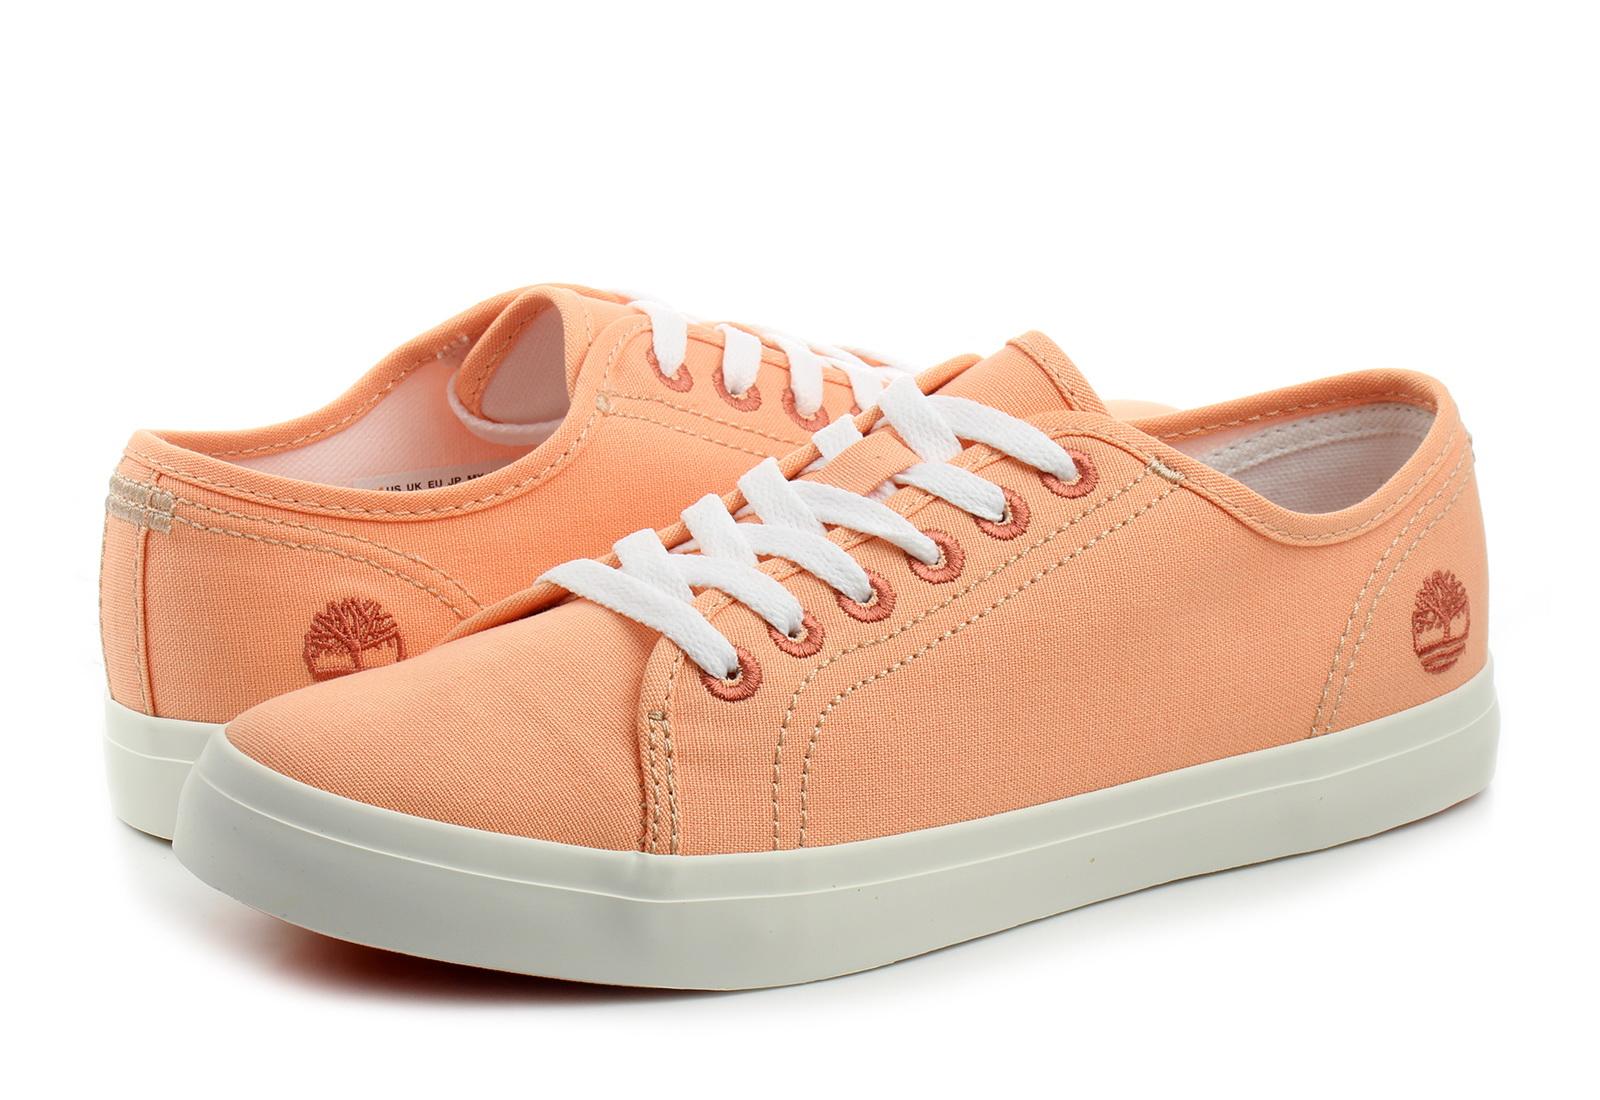 Timberland Shoes Newport Bay